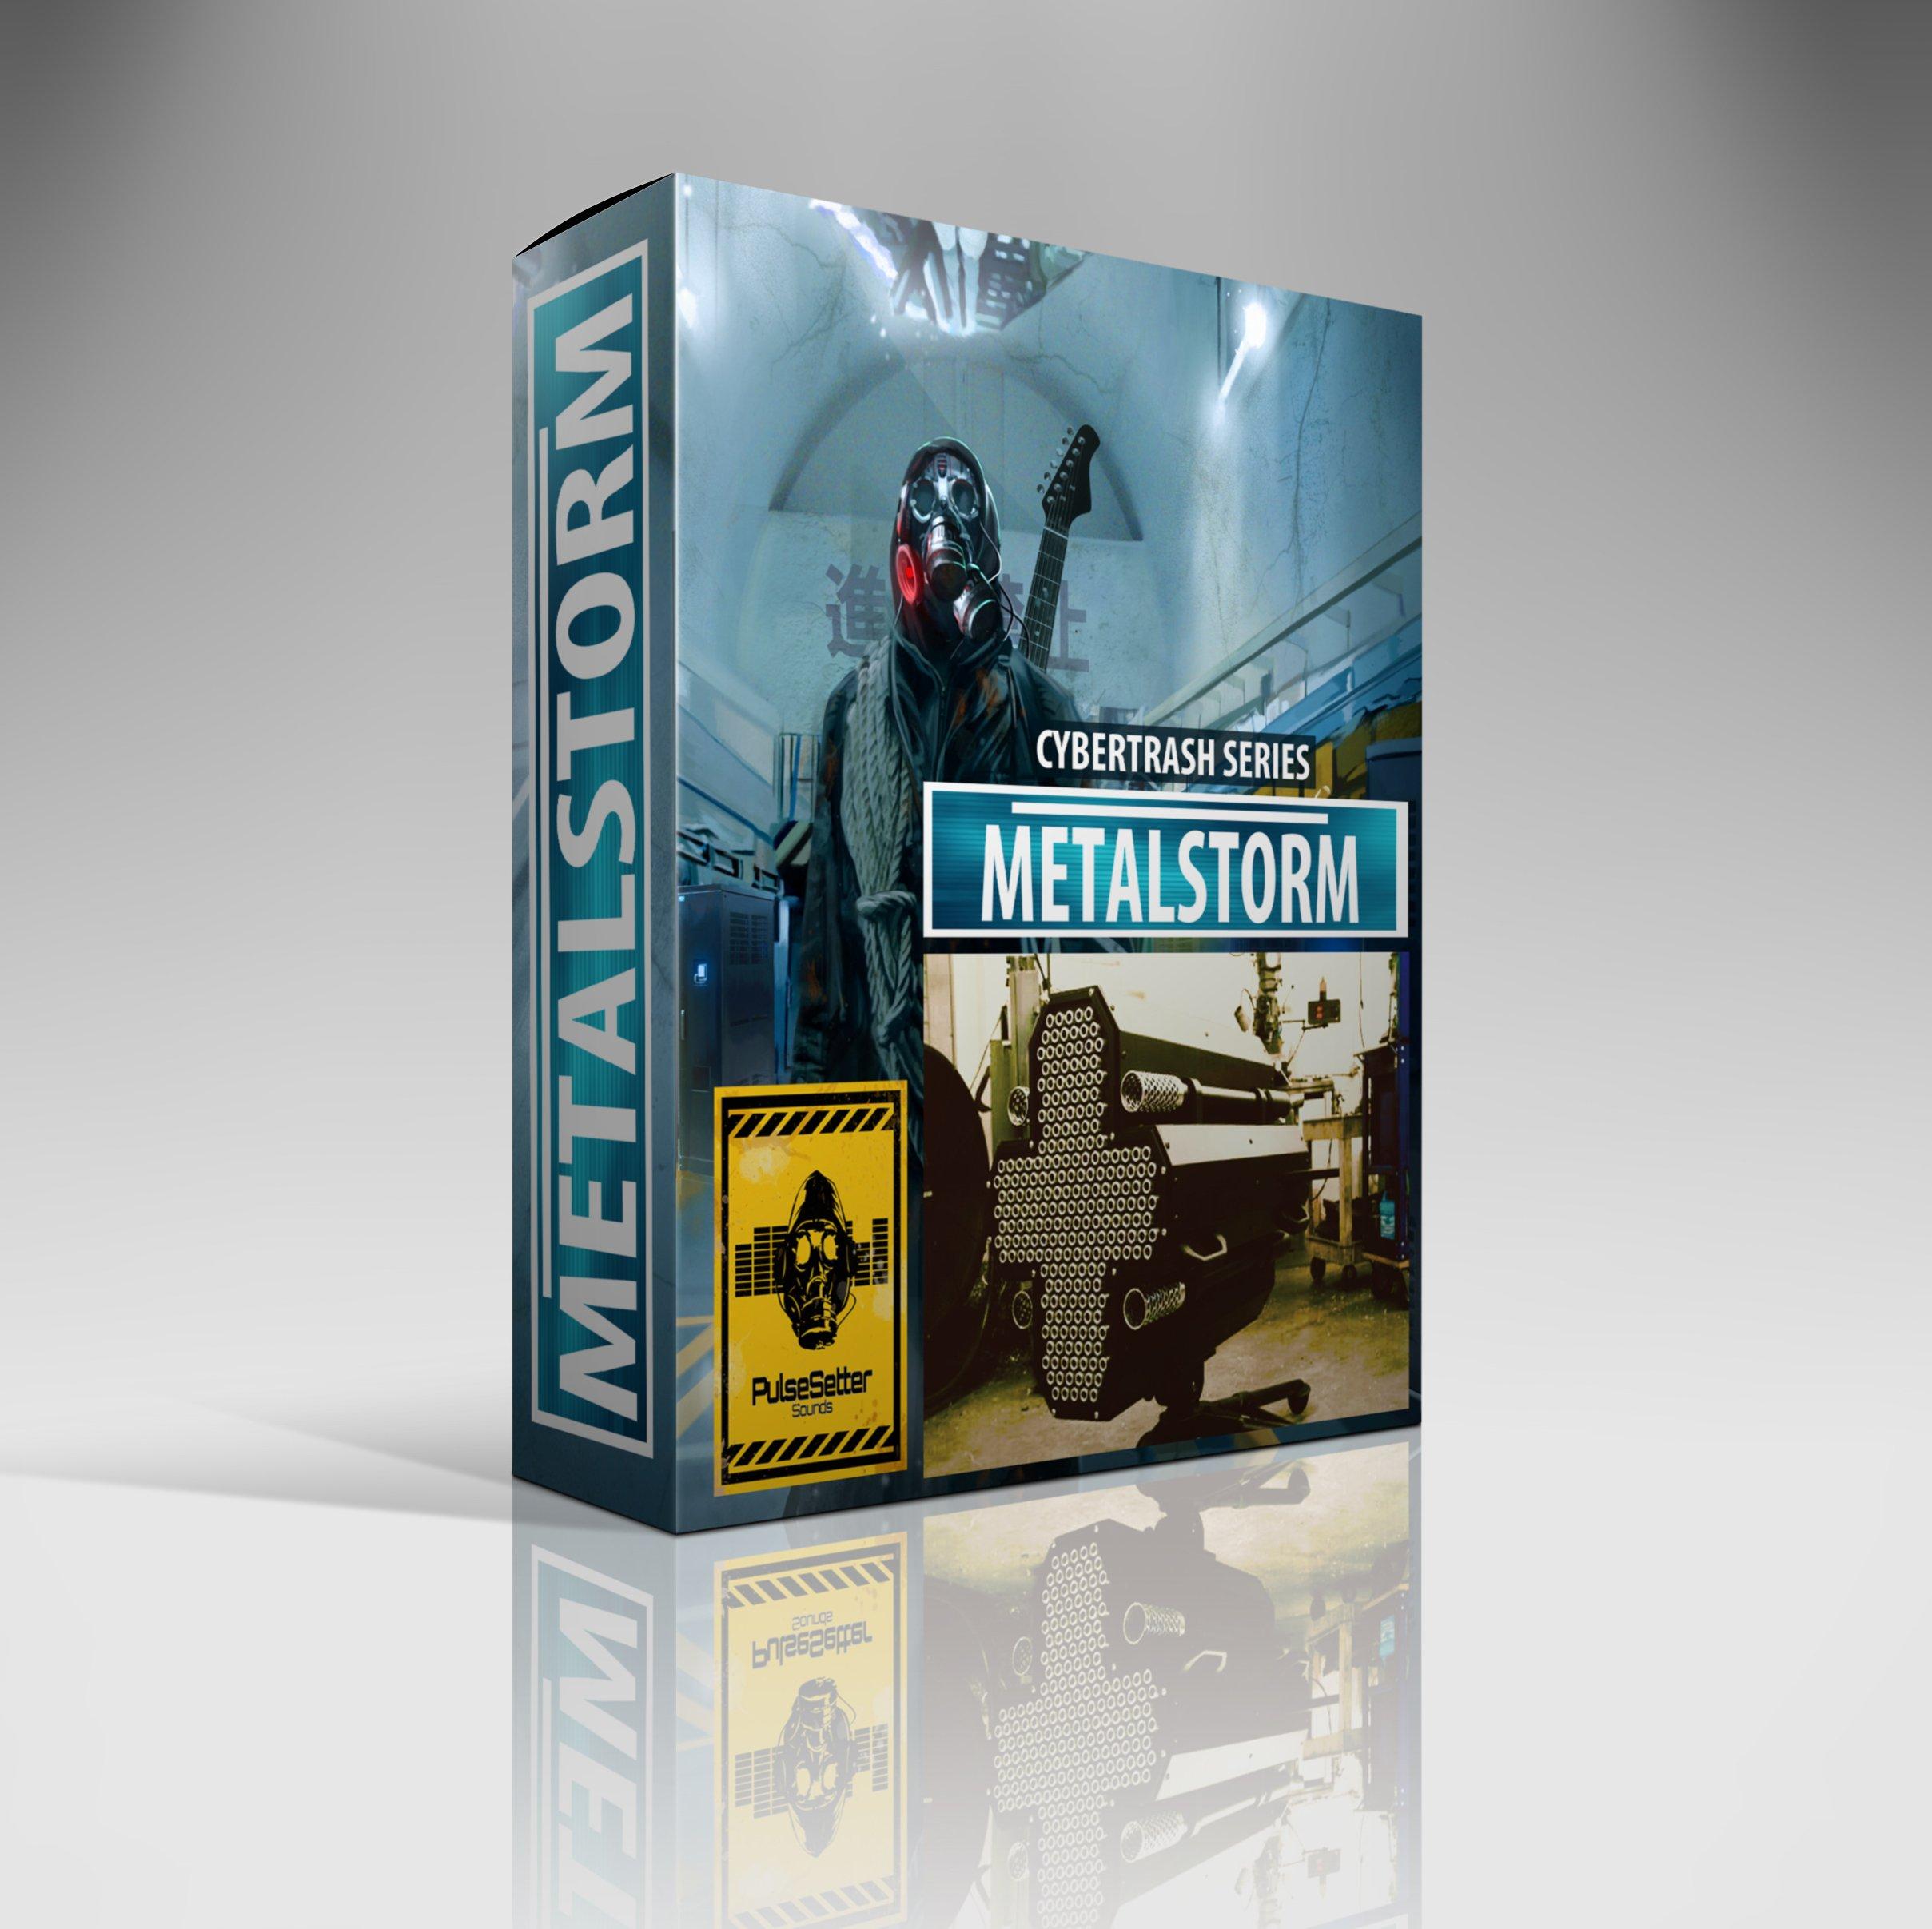 Metalstorm | PulseSetter-Sounds | Cinematic Sound Design